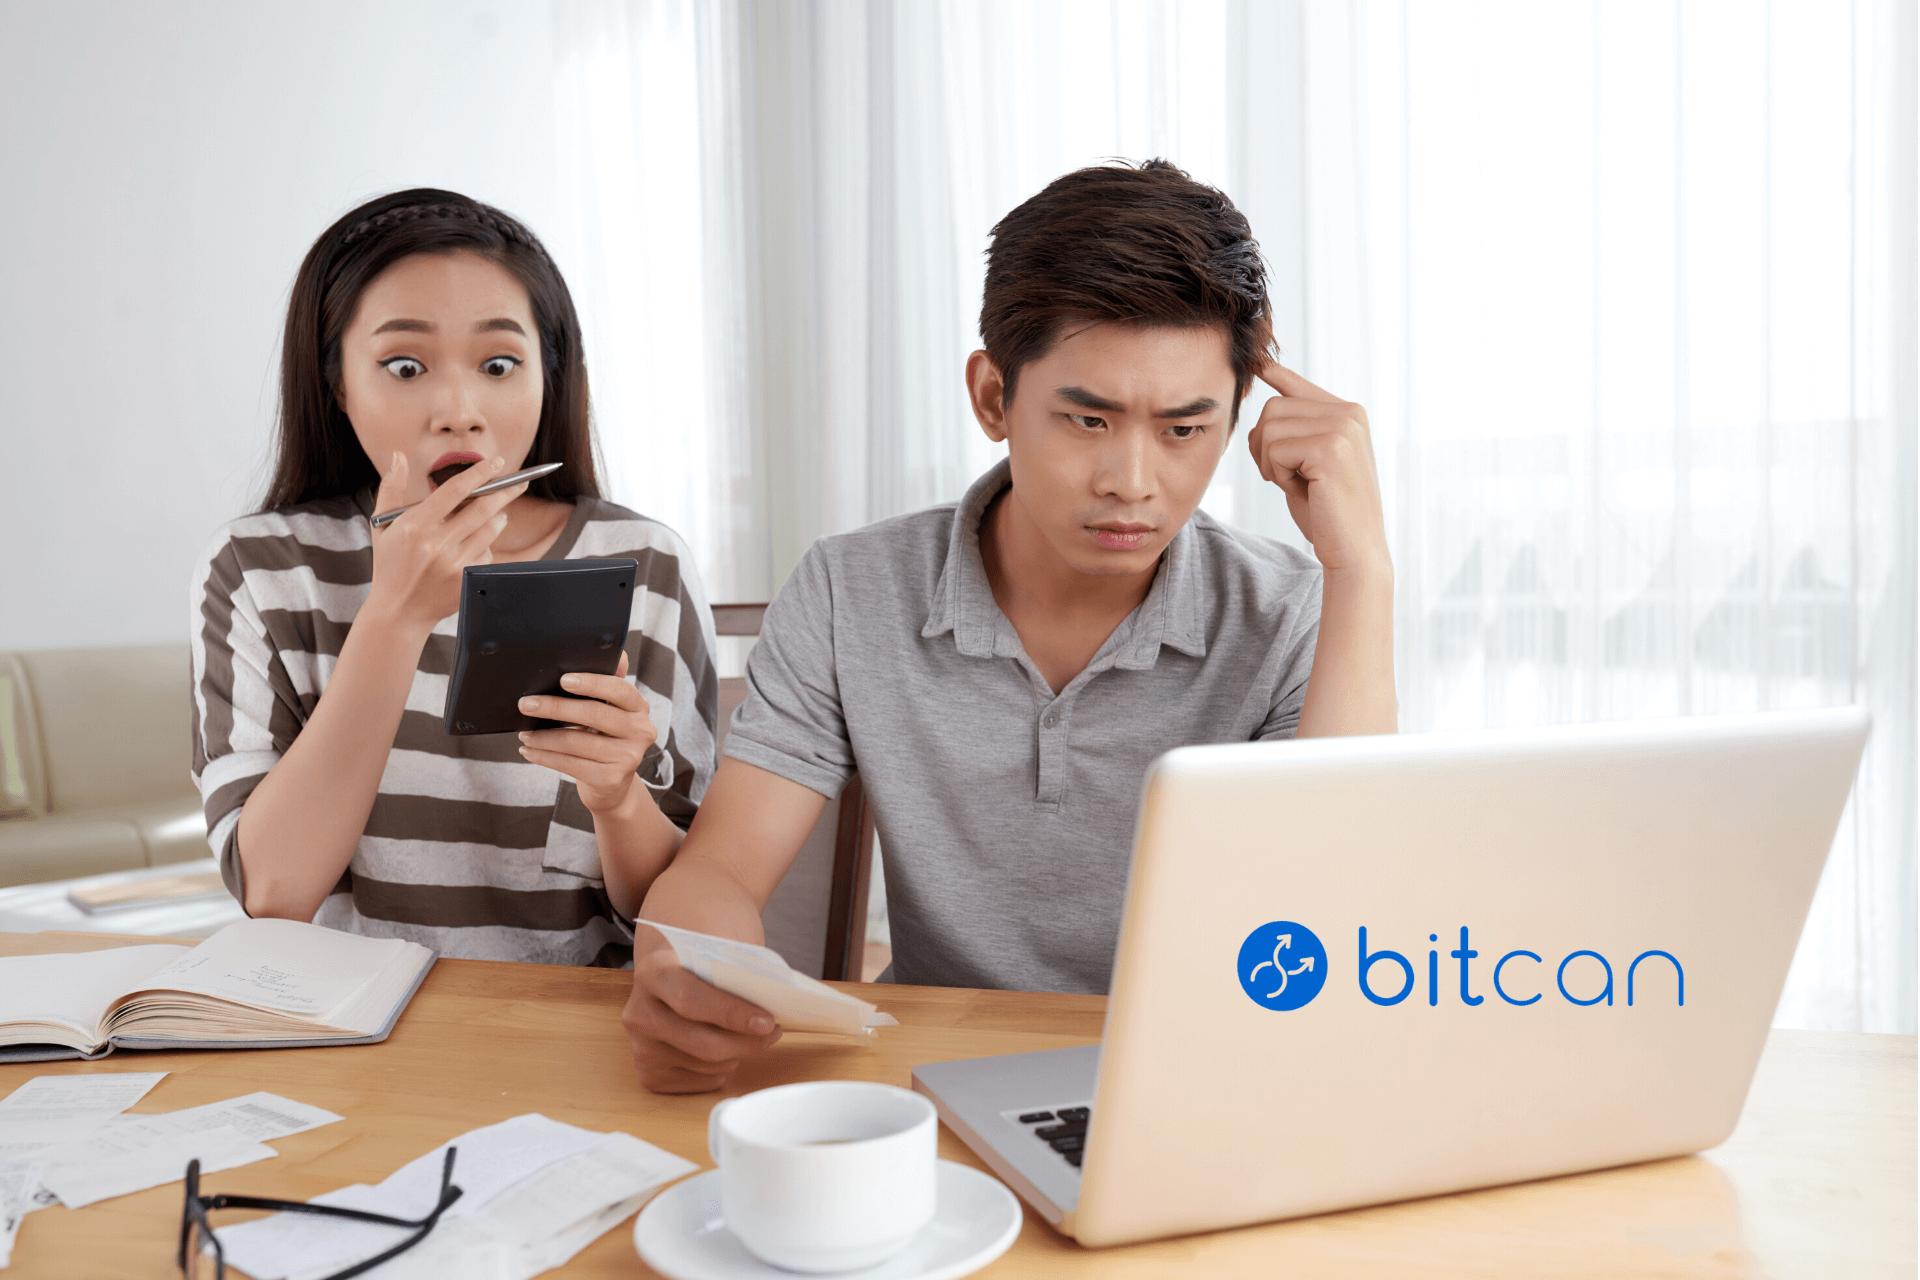 Czemu Bitcoin jest taki drogi?